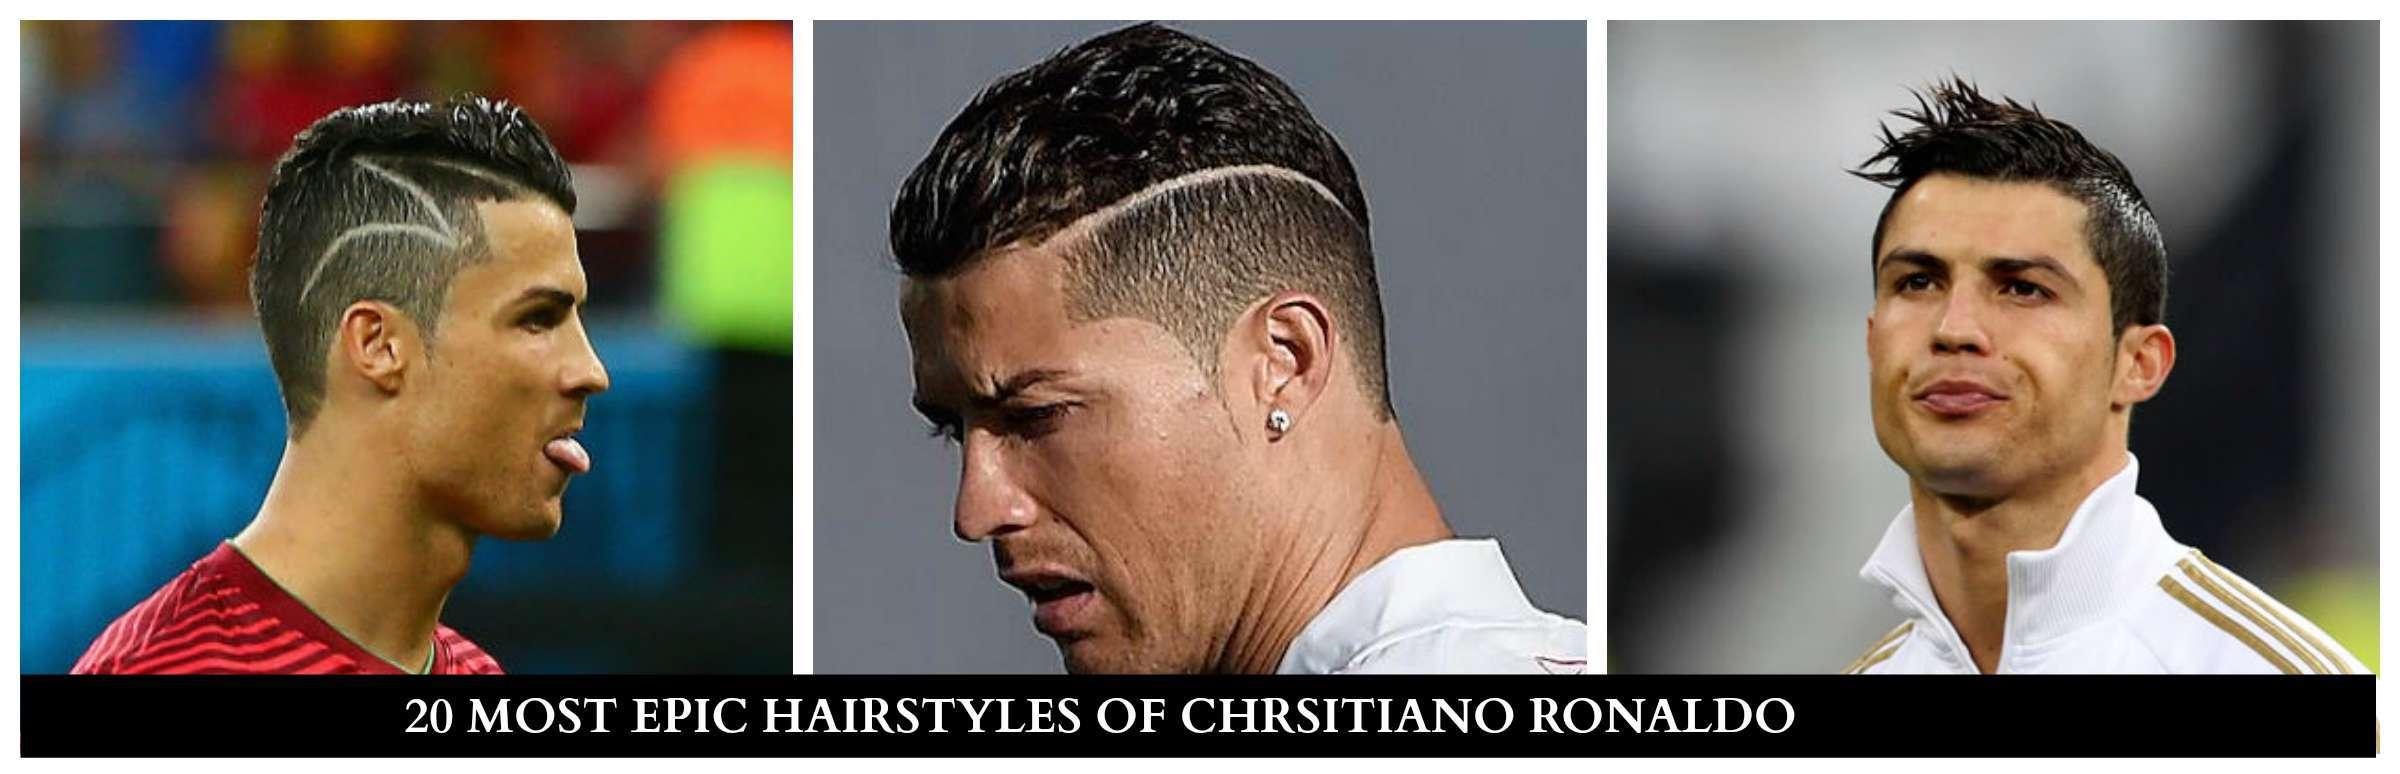 LATEST HAIRSTYLES OF CHRISTIANO RONALDO